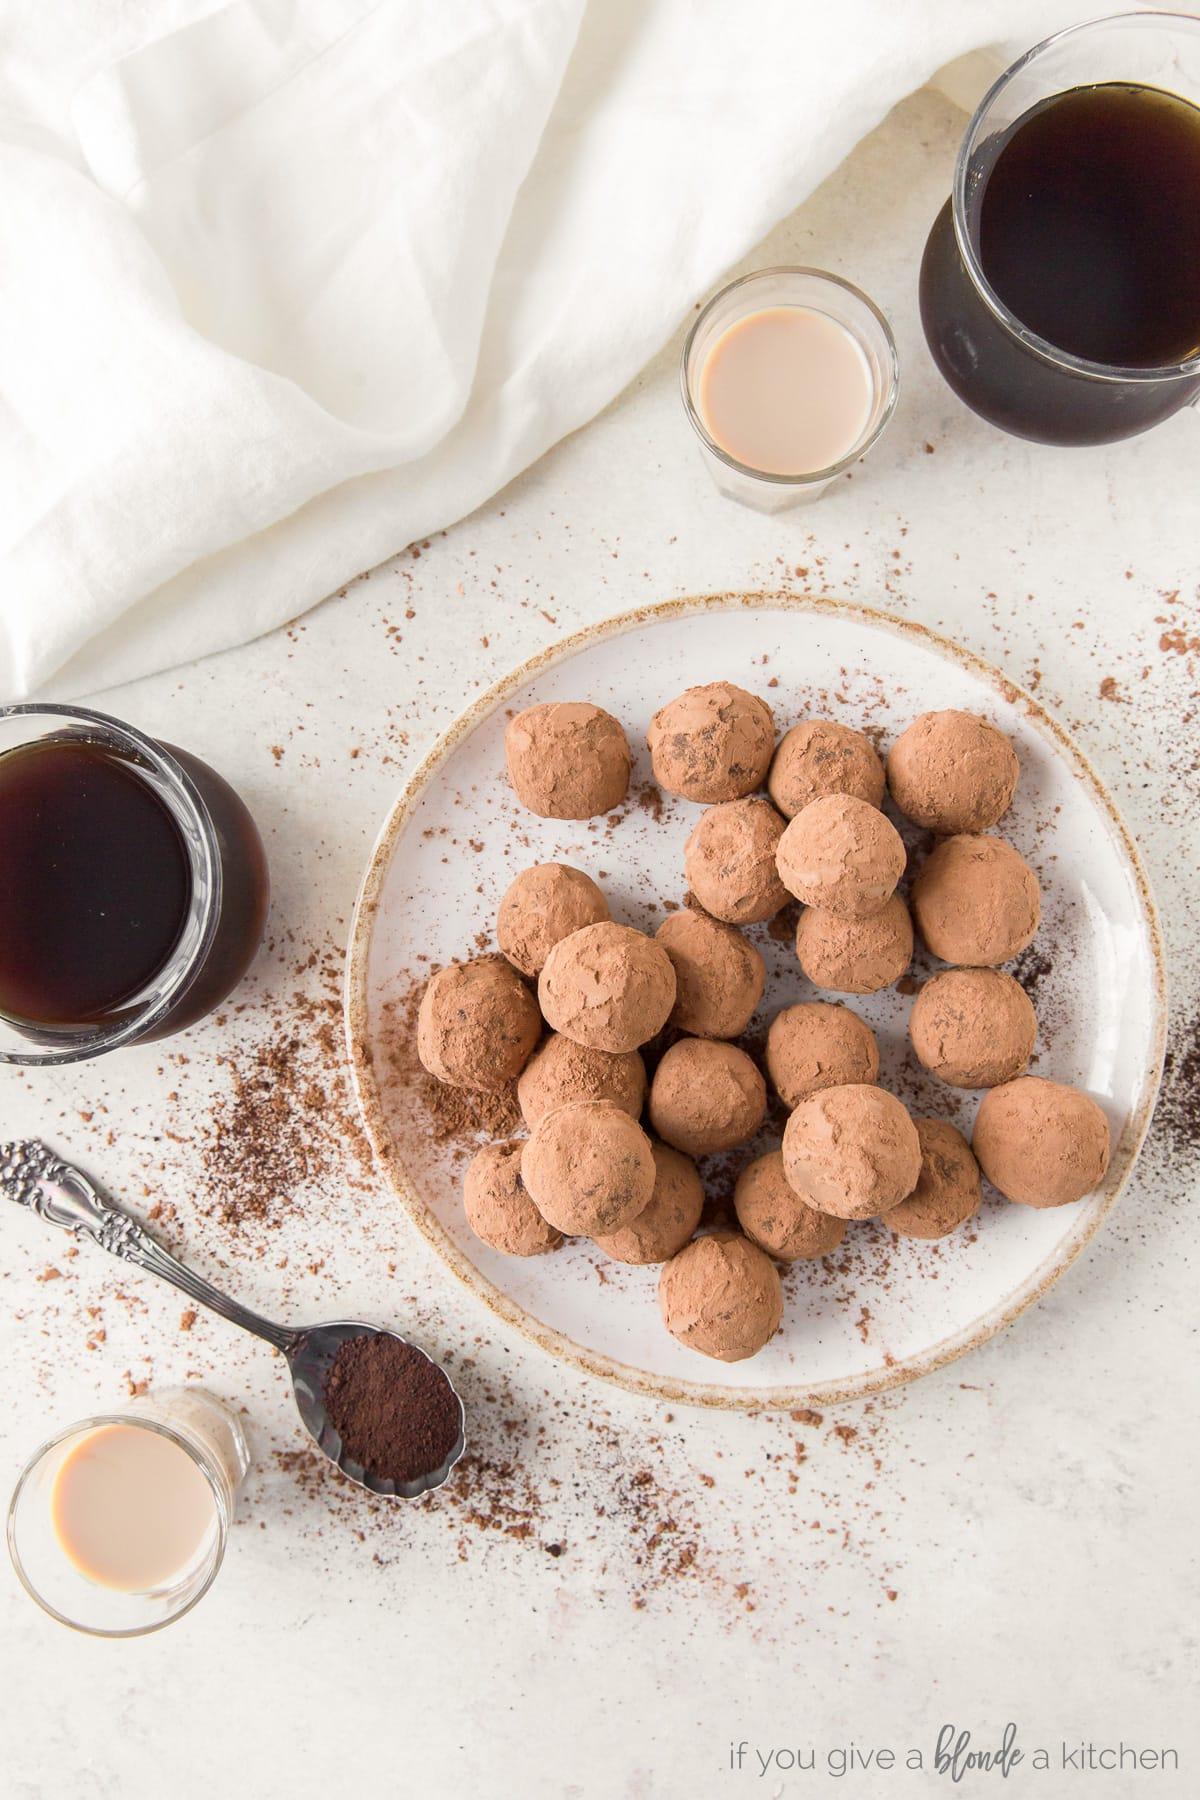 plate of chocolate espresso truffles; glasses of espresso and Irish cream next to plate